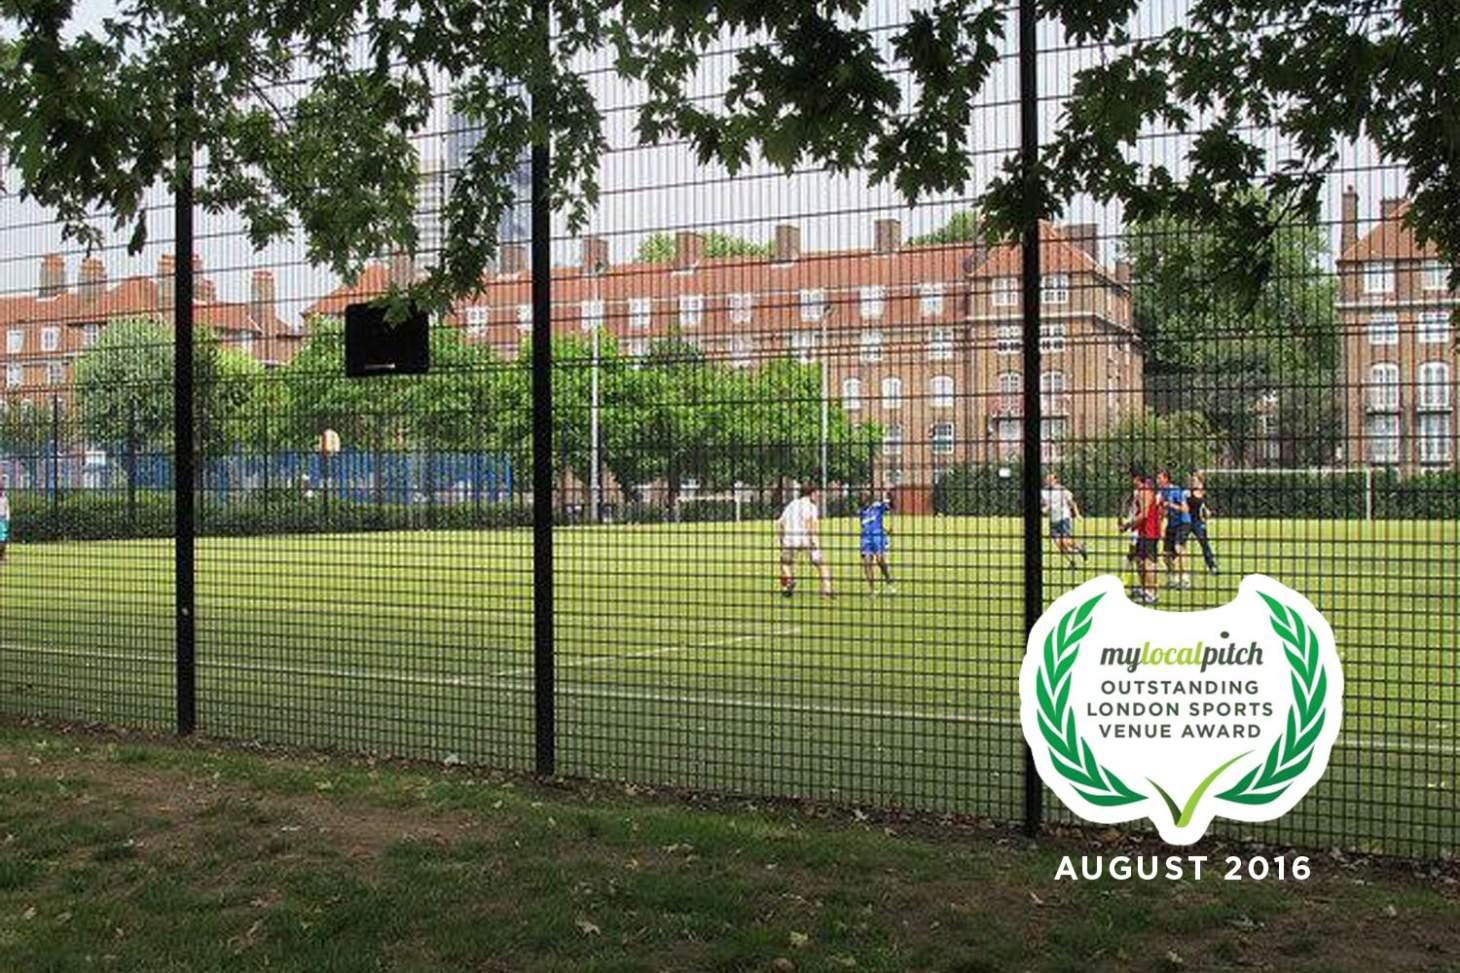 Tabard Gardens 5 a side | Astroturf football pitch